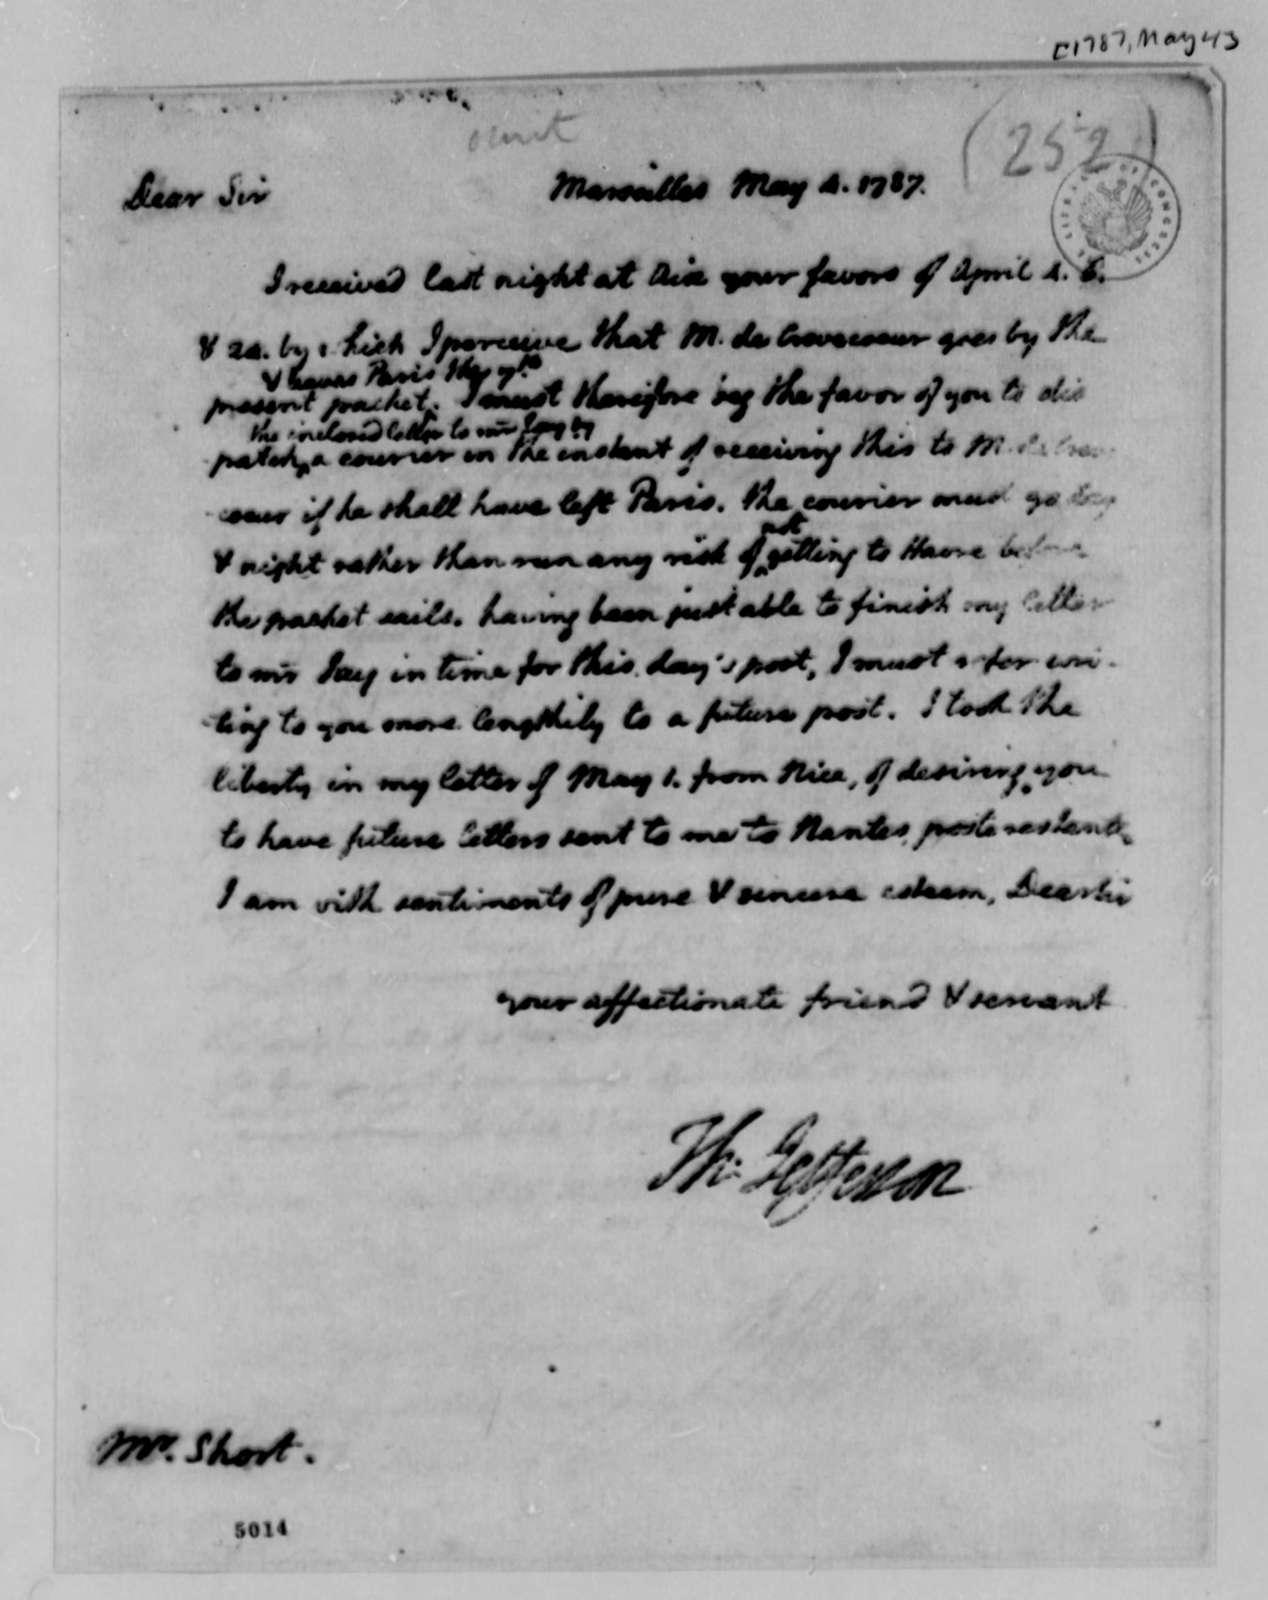 Thomas Jefferson to William Short, May 4, 1787